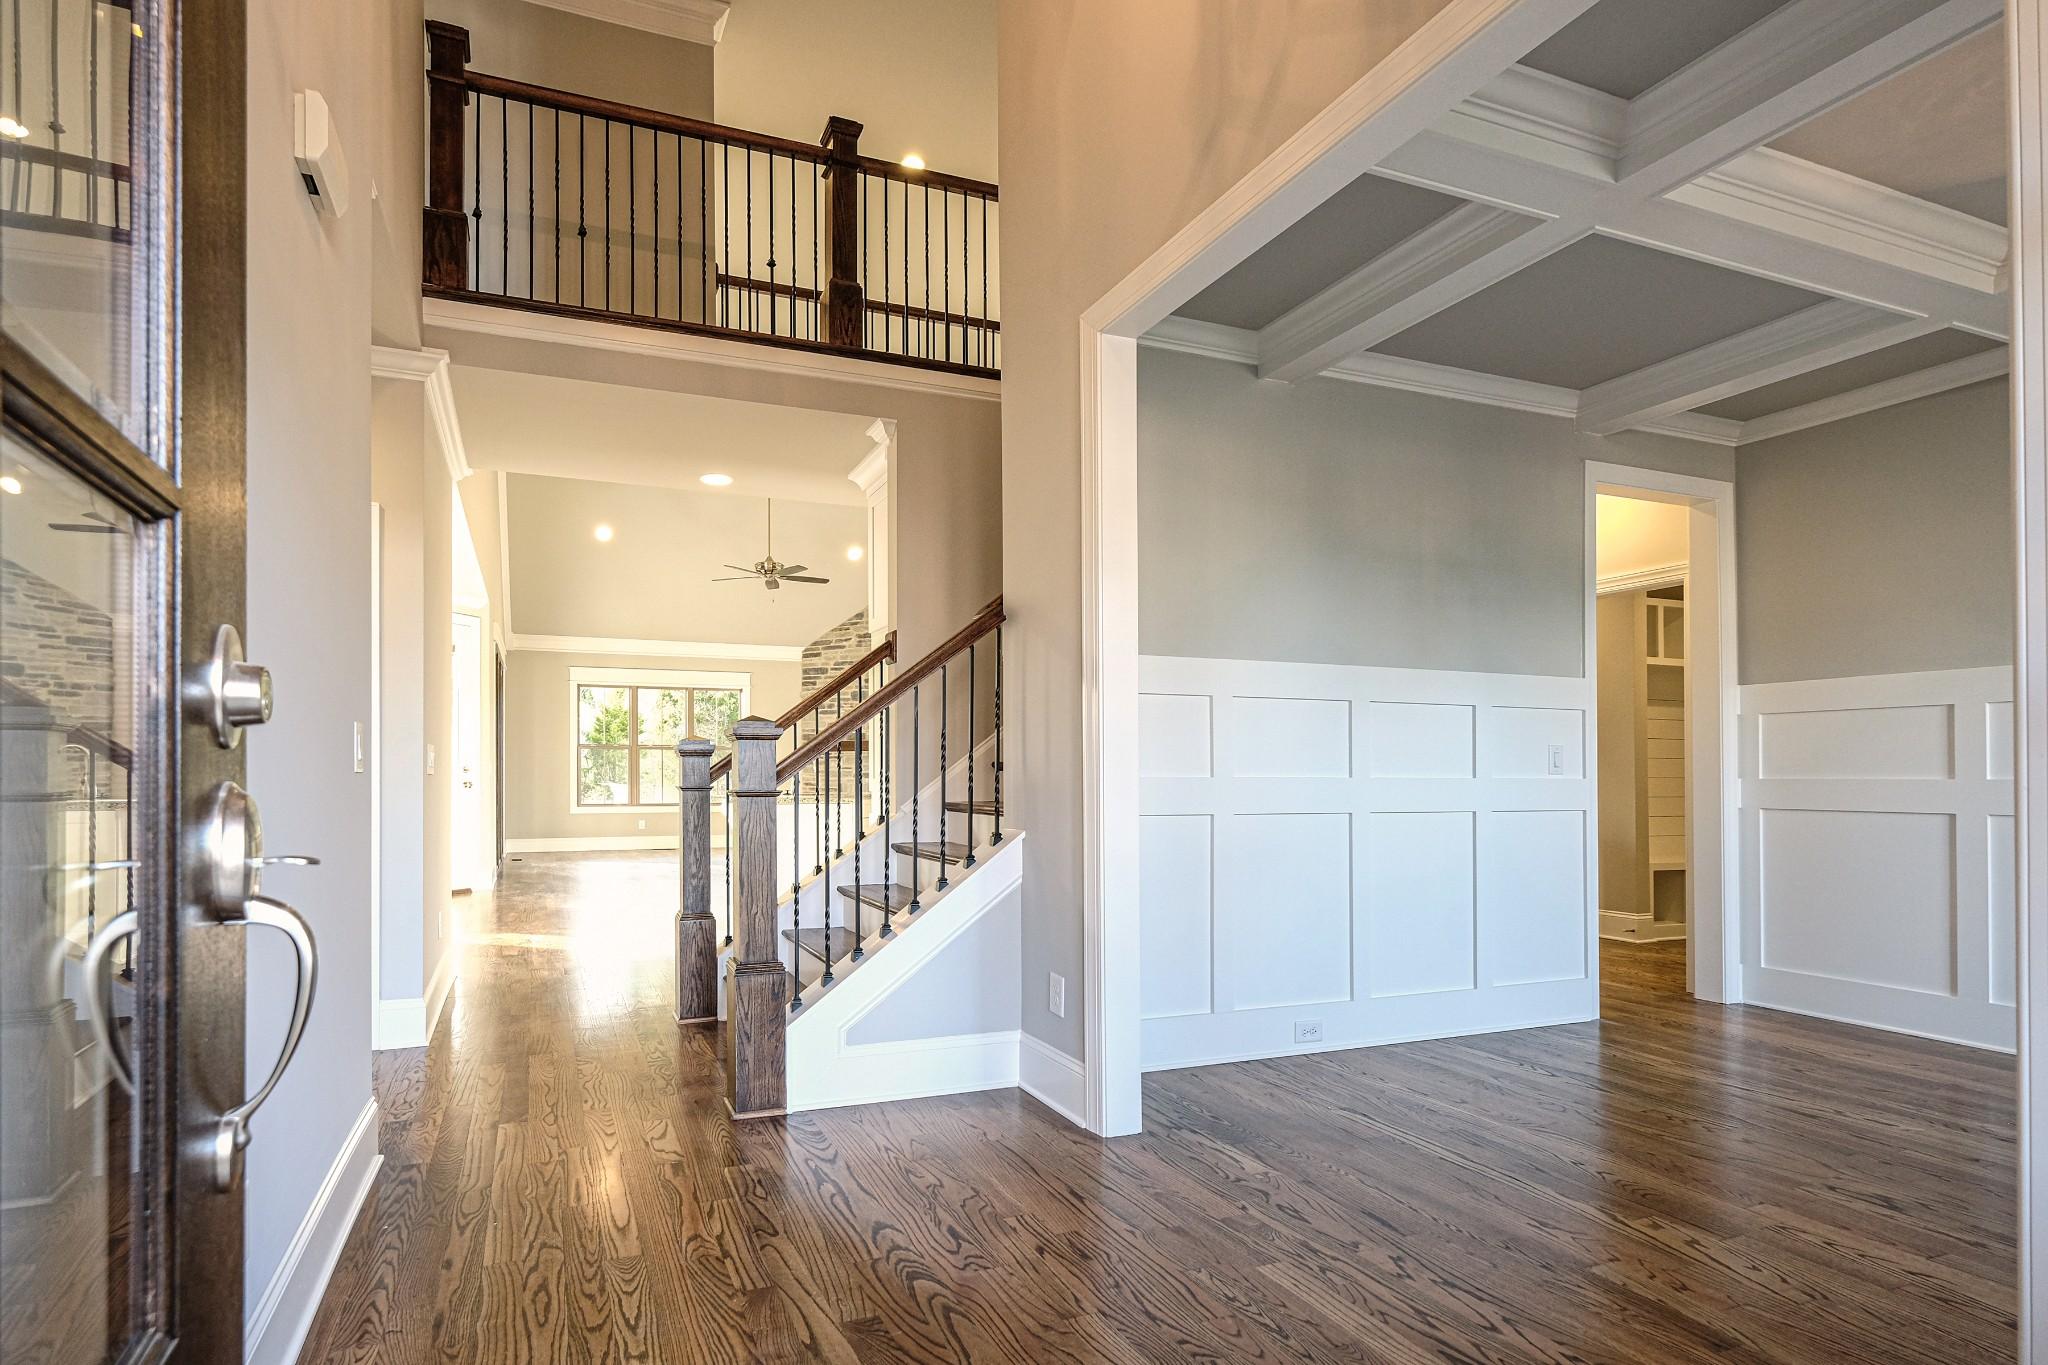 2059 Autumn Ridge Way (Lot 245), Spring Hill, TN 37174 - Spring Hill, TN real estate listing